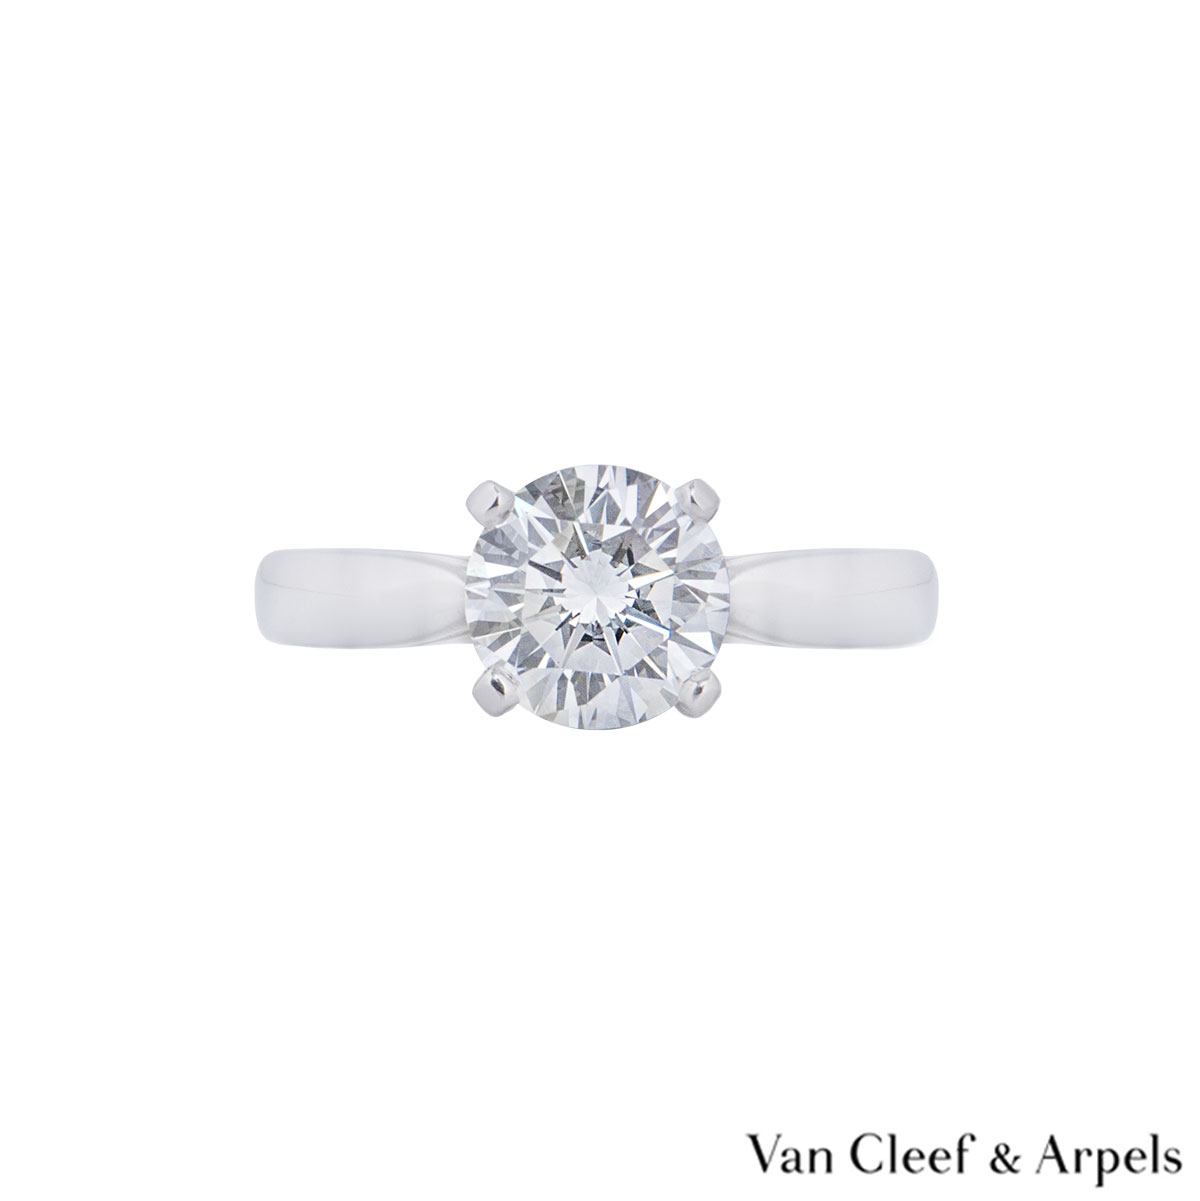 Van Cleef & Arpels Platinum Diamond Bonheur Ring 1.64ct E/VVS2